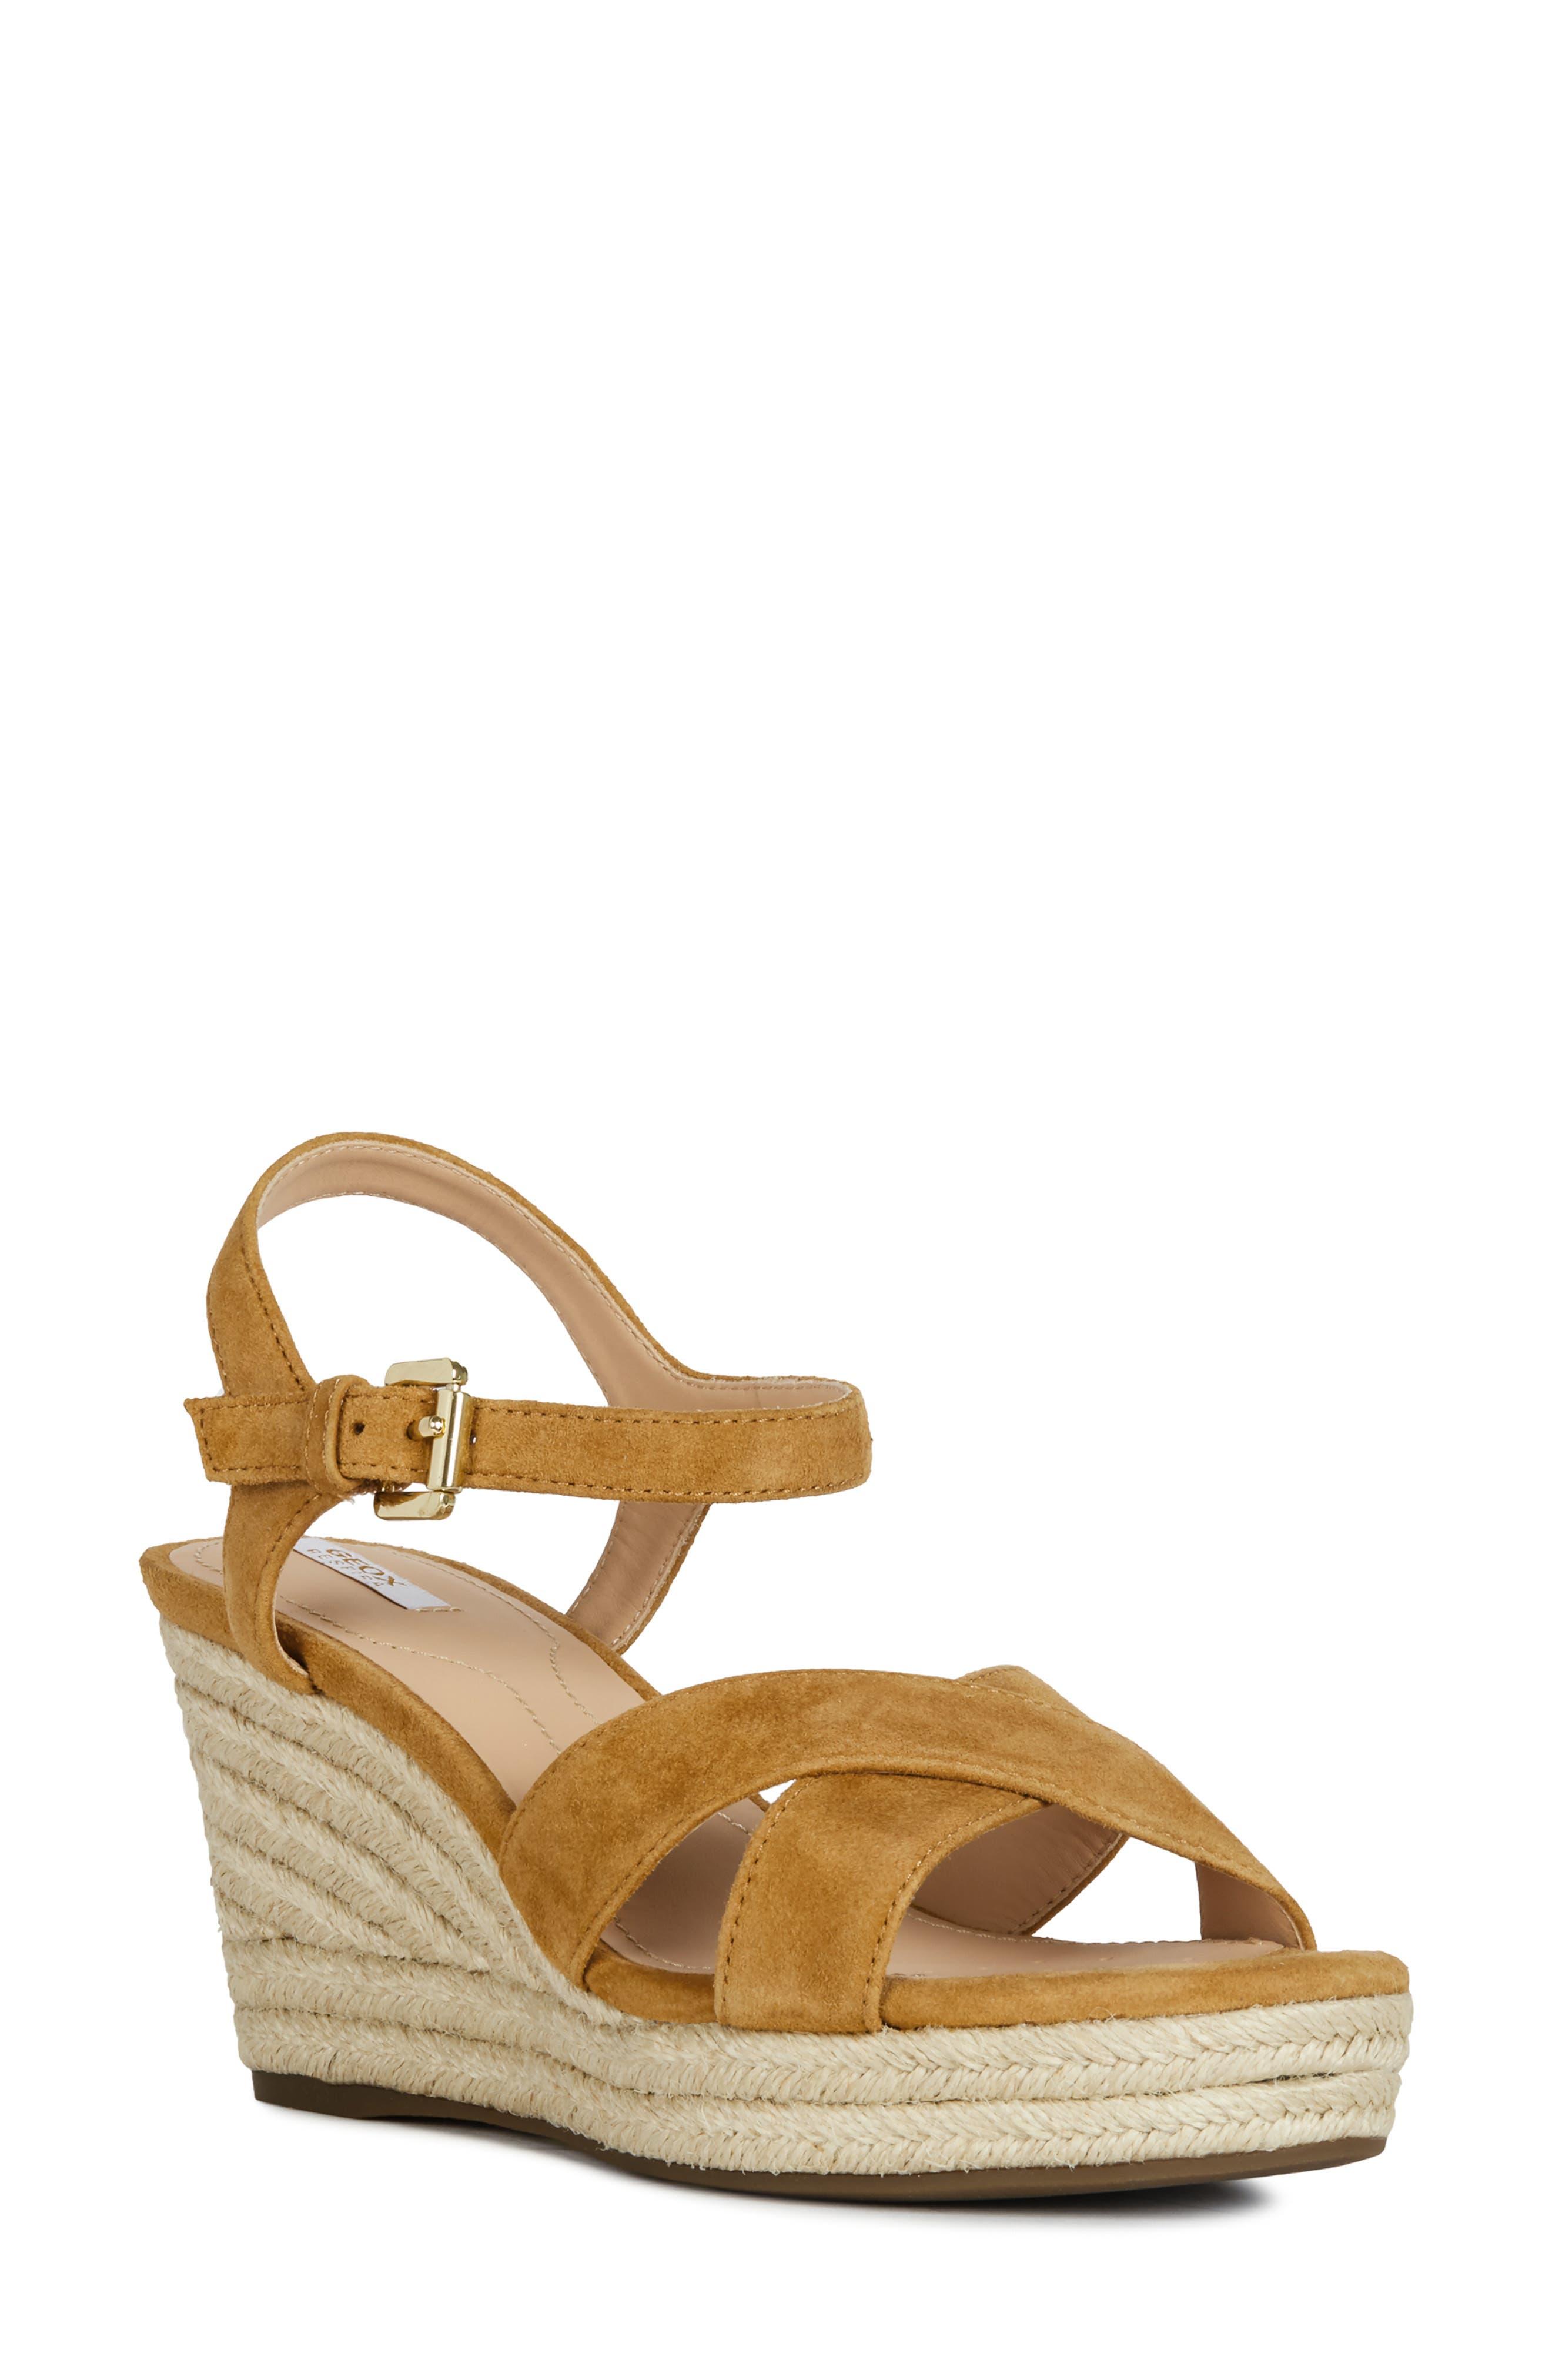 Geox Soleil Wedge Sandal, Yellow